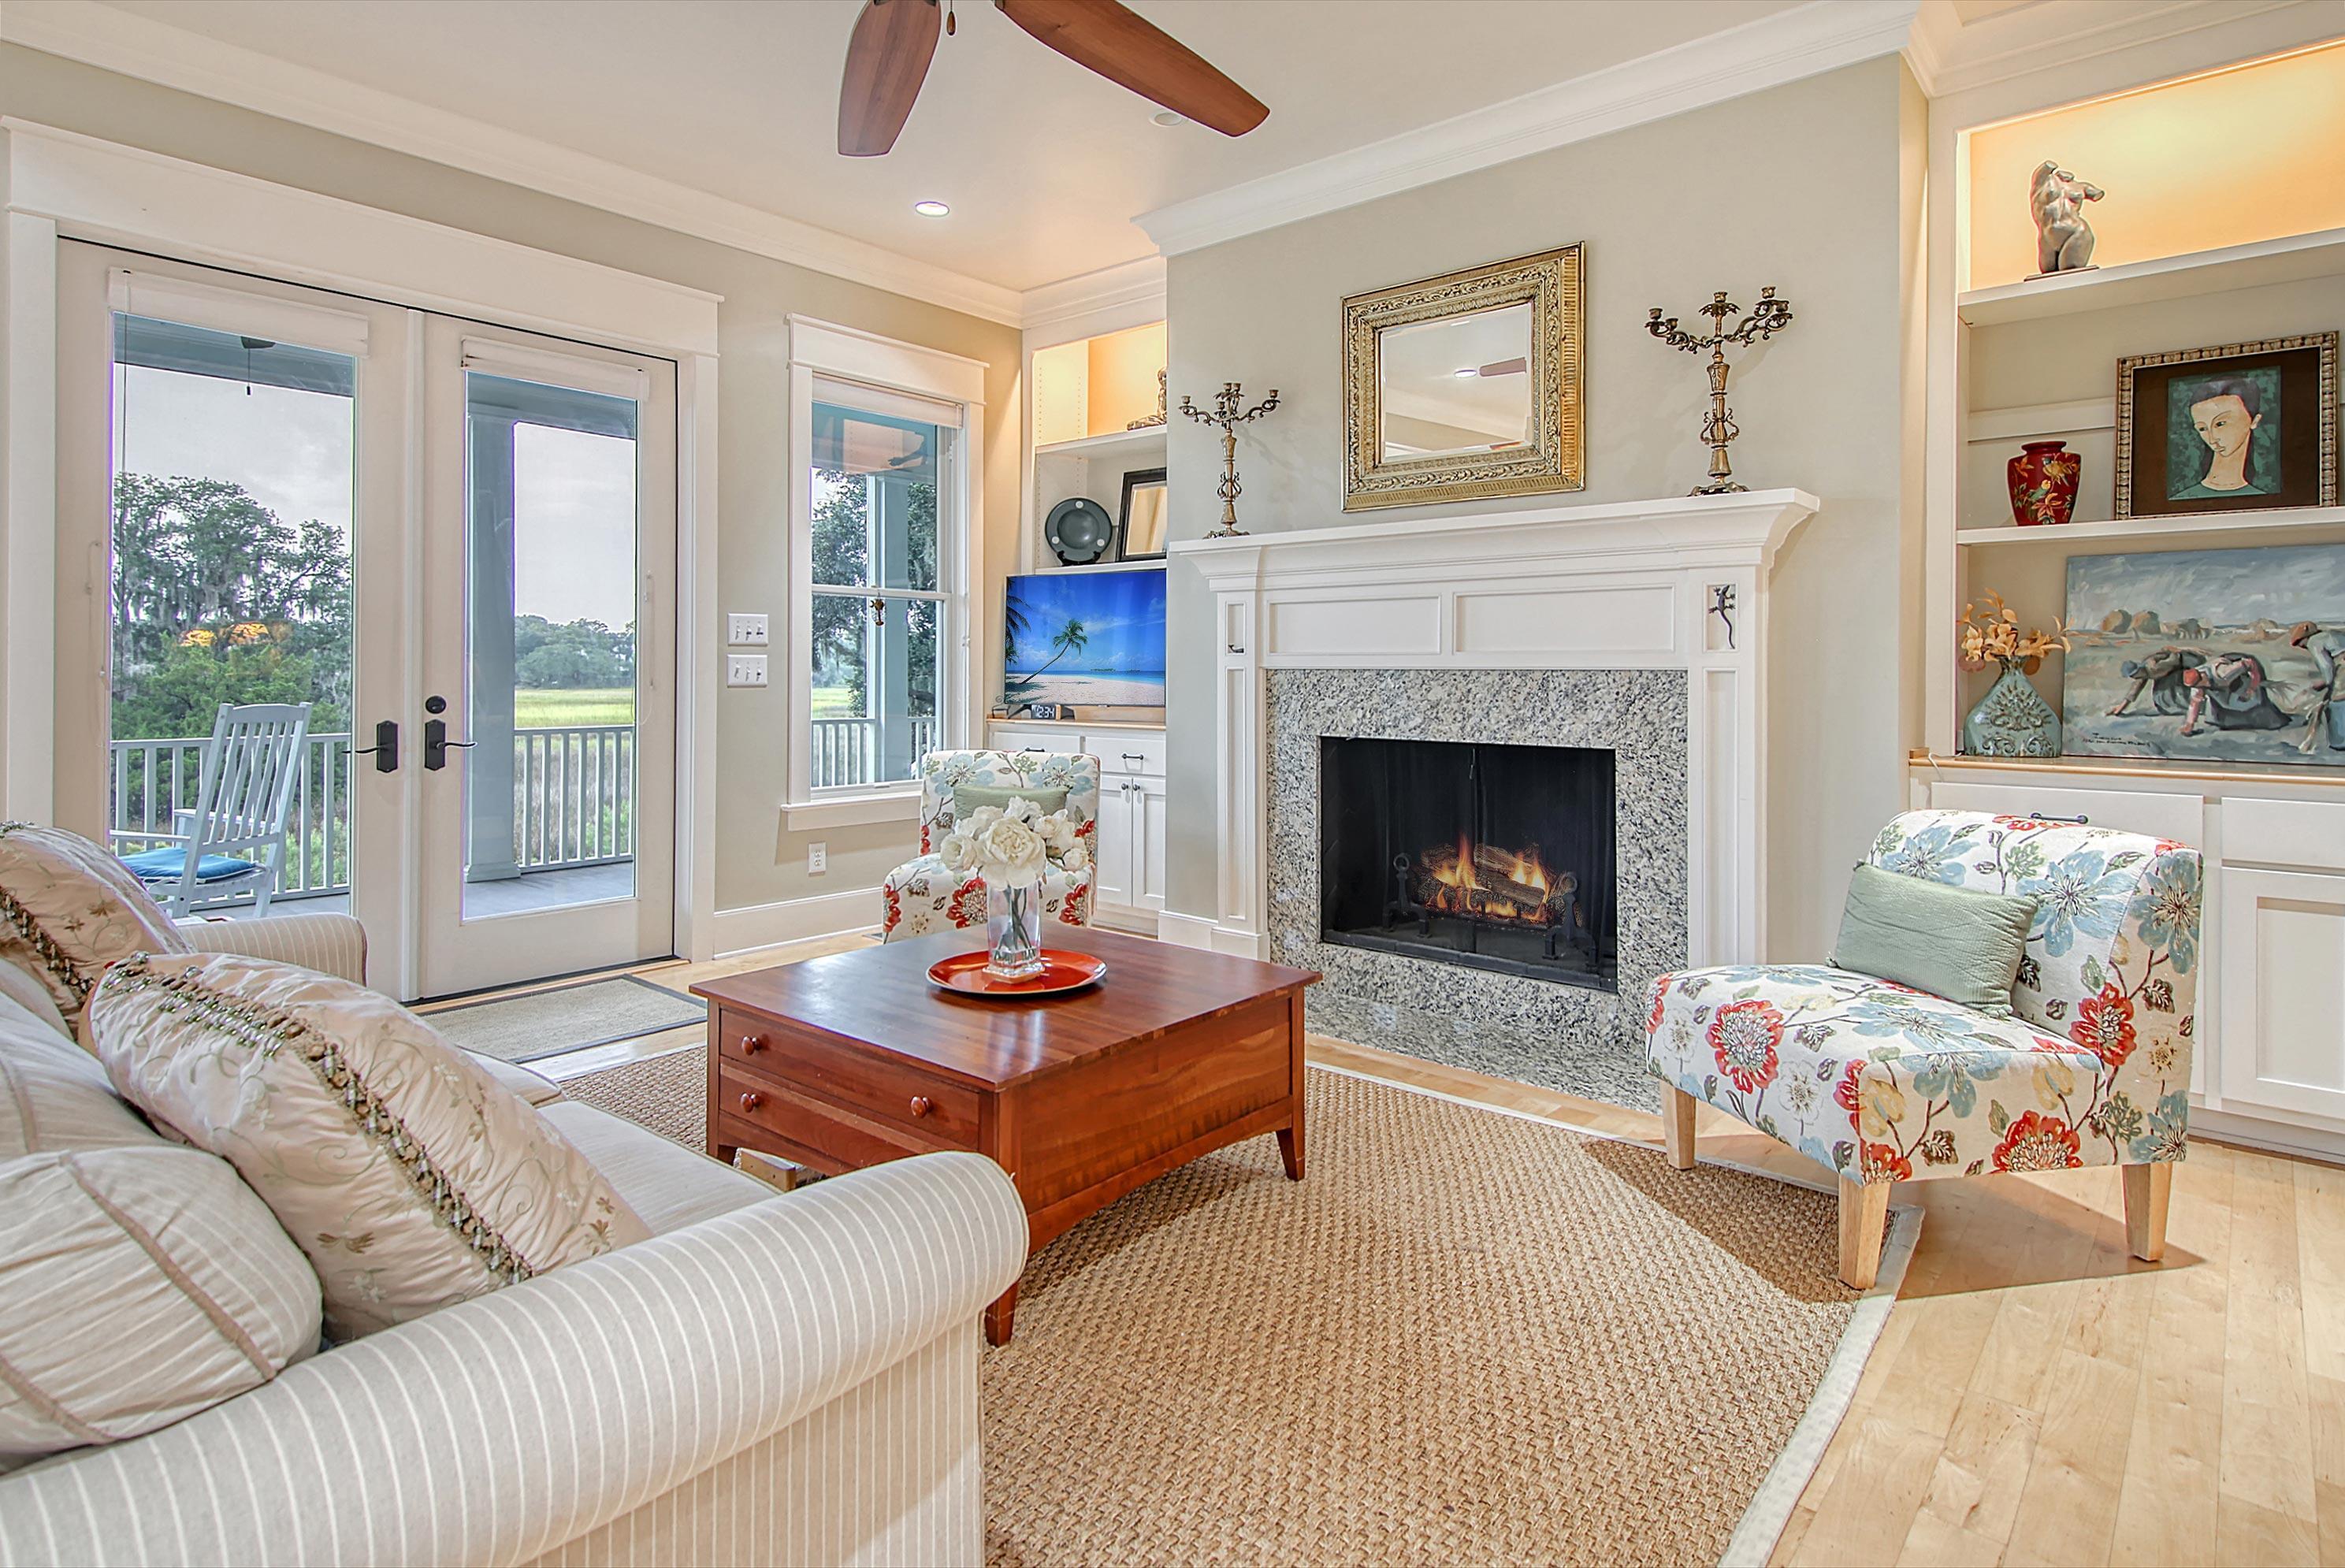 Scanlonville Homes For Sale - 152 6th, Mount Pleasant, SC - 9